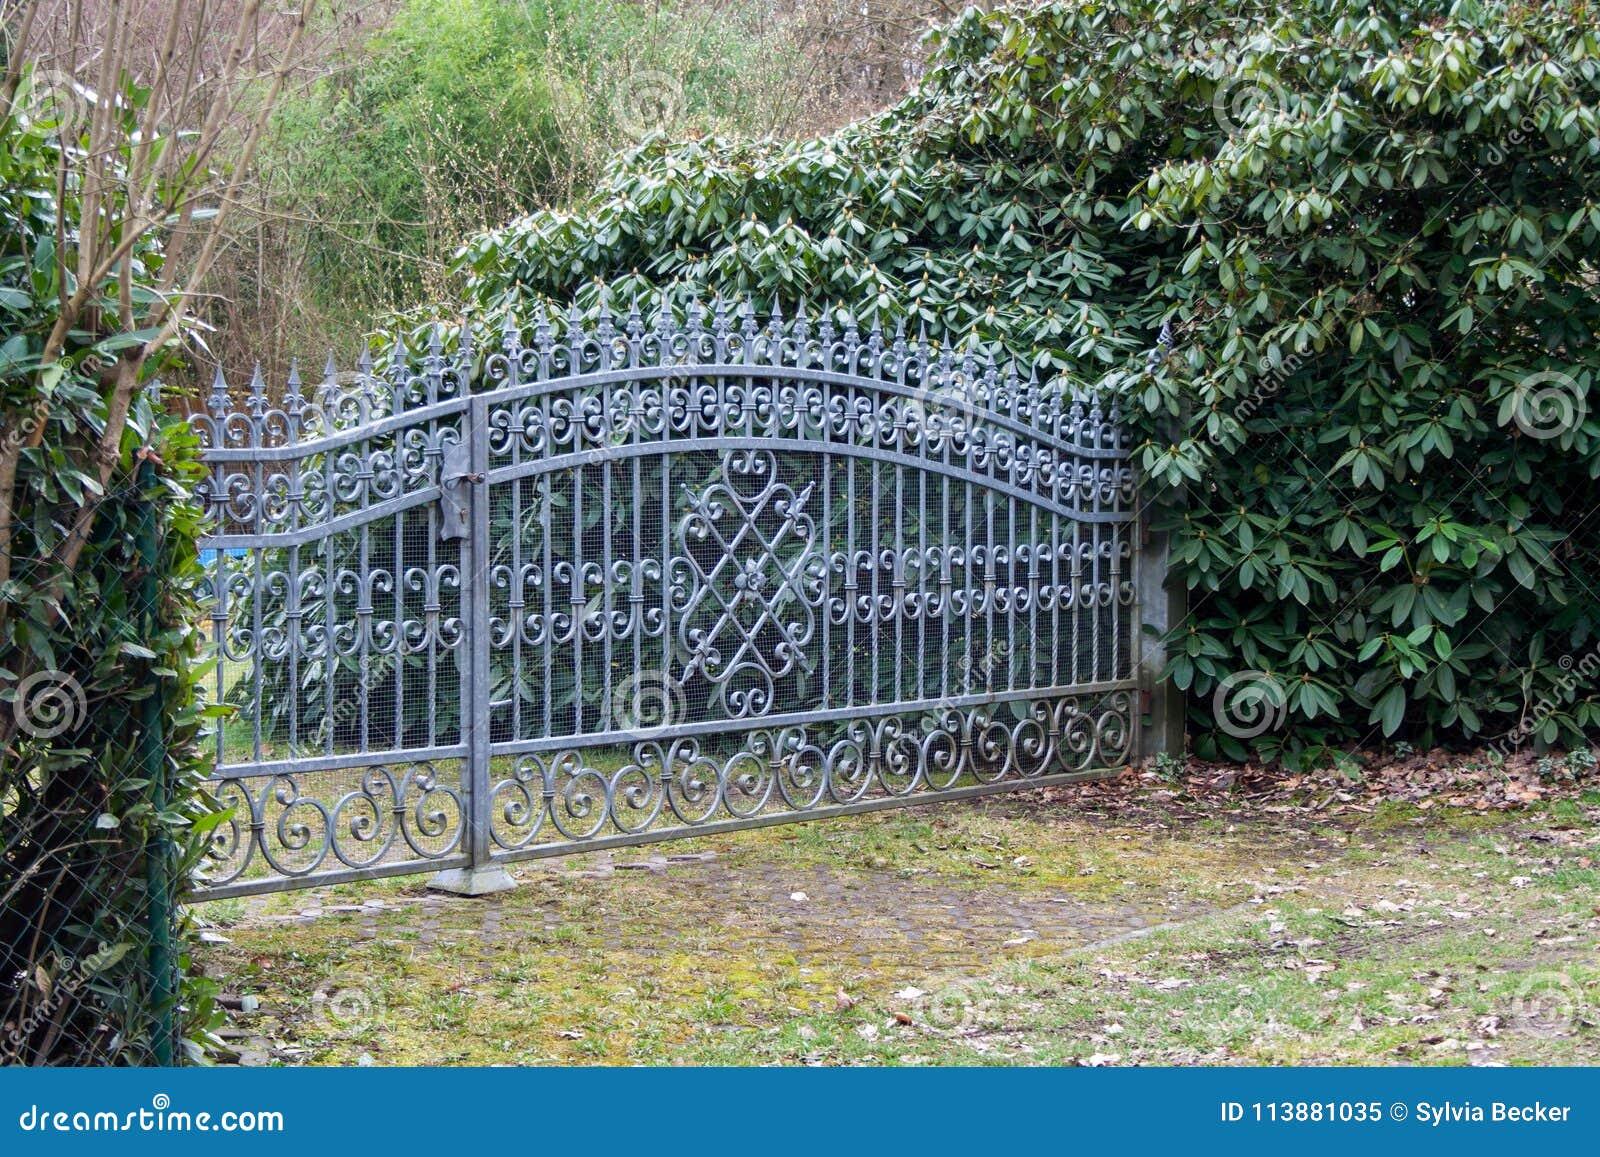 Porte De Jardin En Fer Forgé Image stock - Image du métal, ressort ...